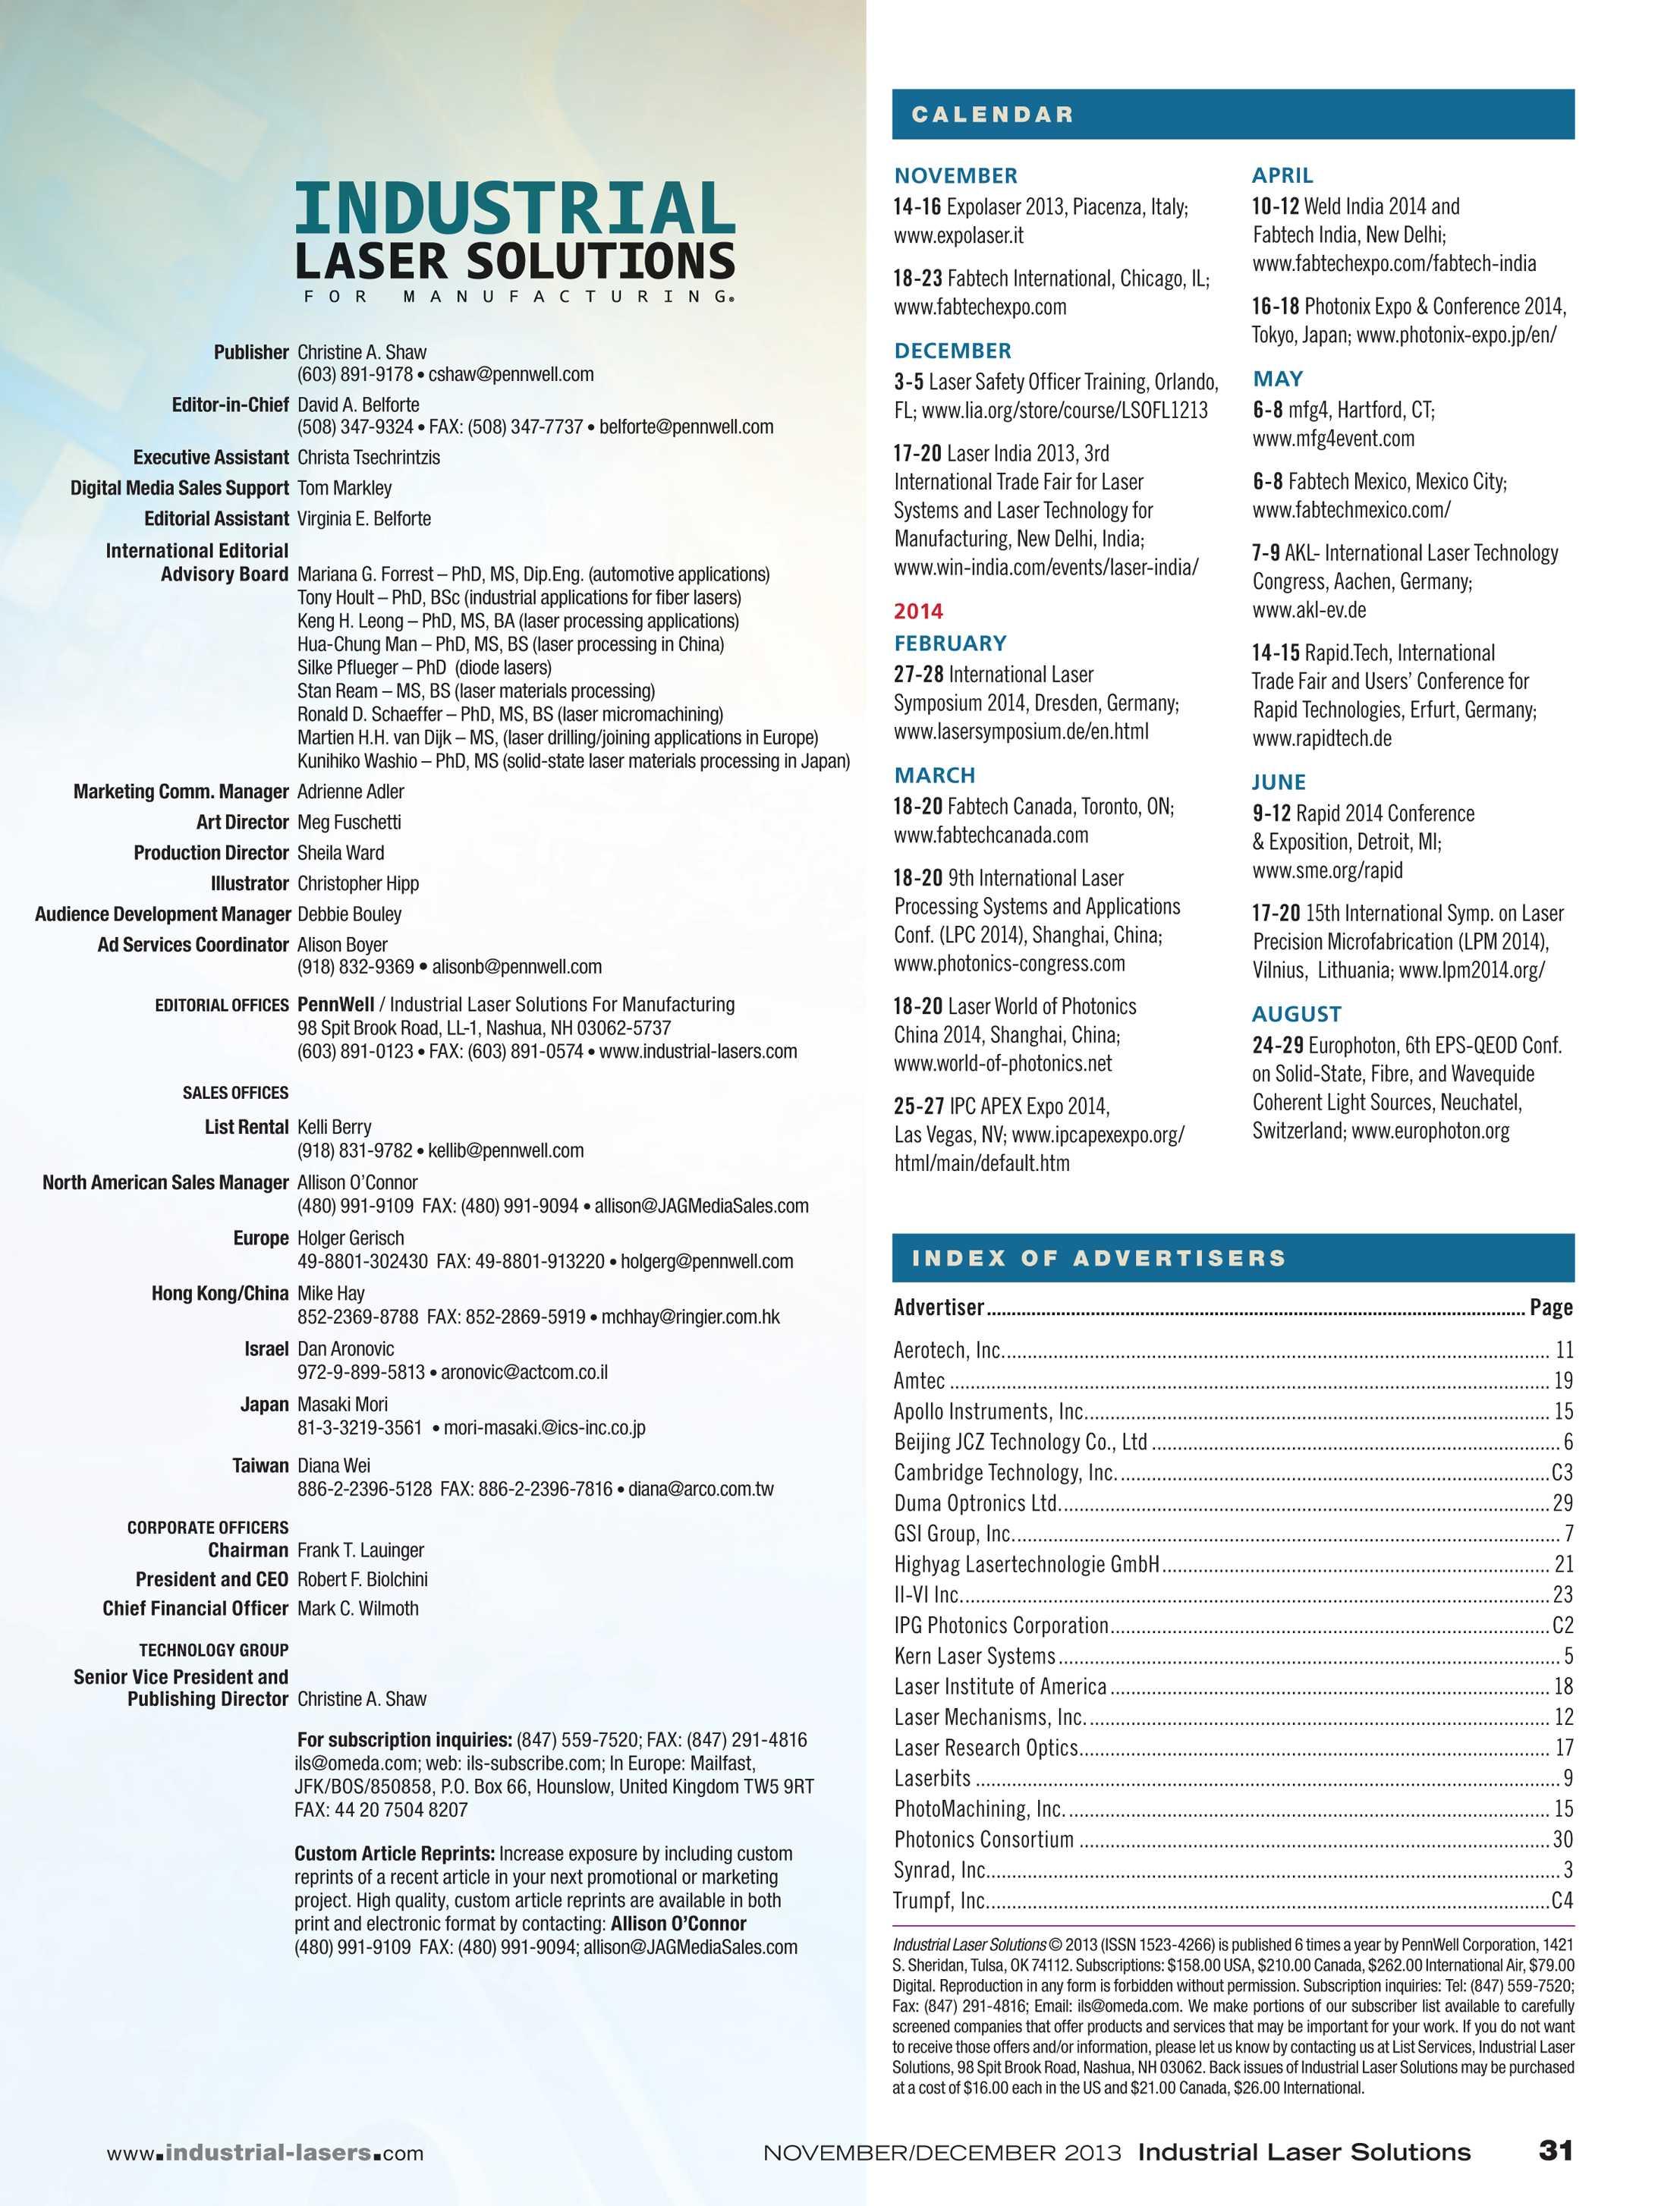 Industrial Laser Solutions - November/December 2013 - page 31